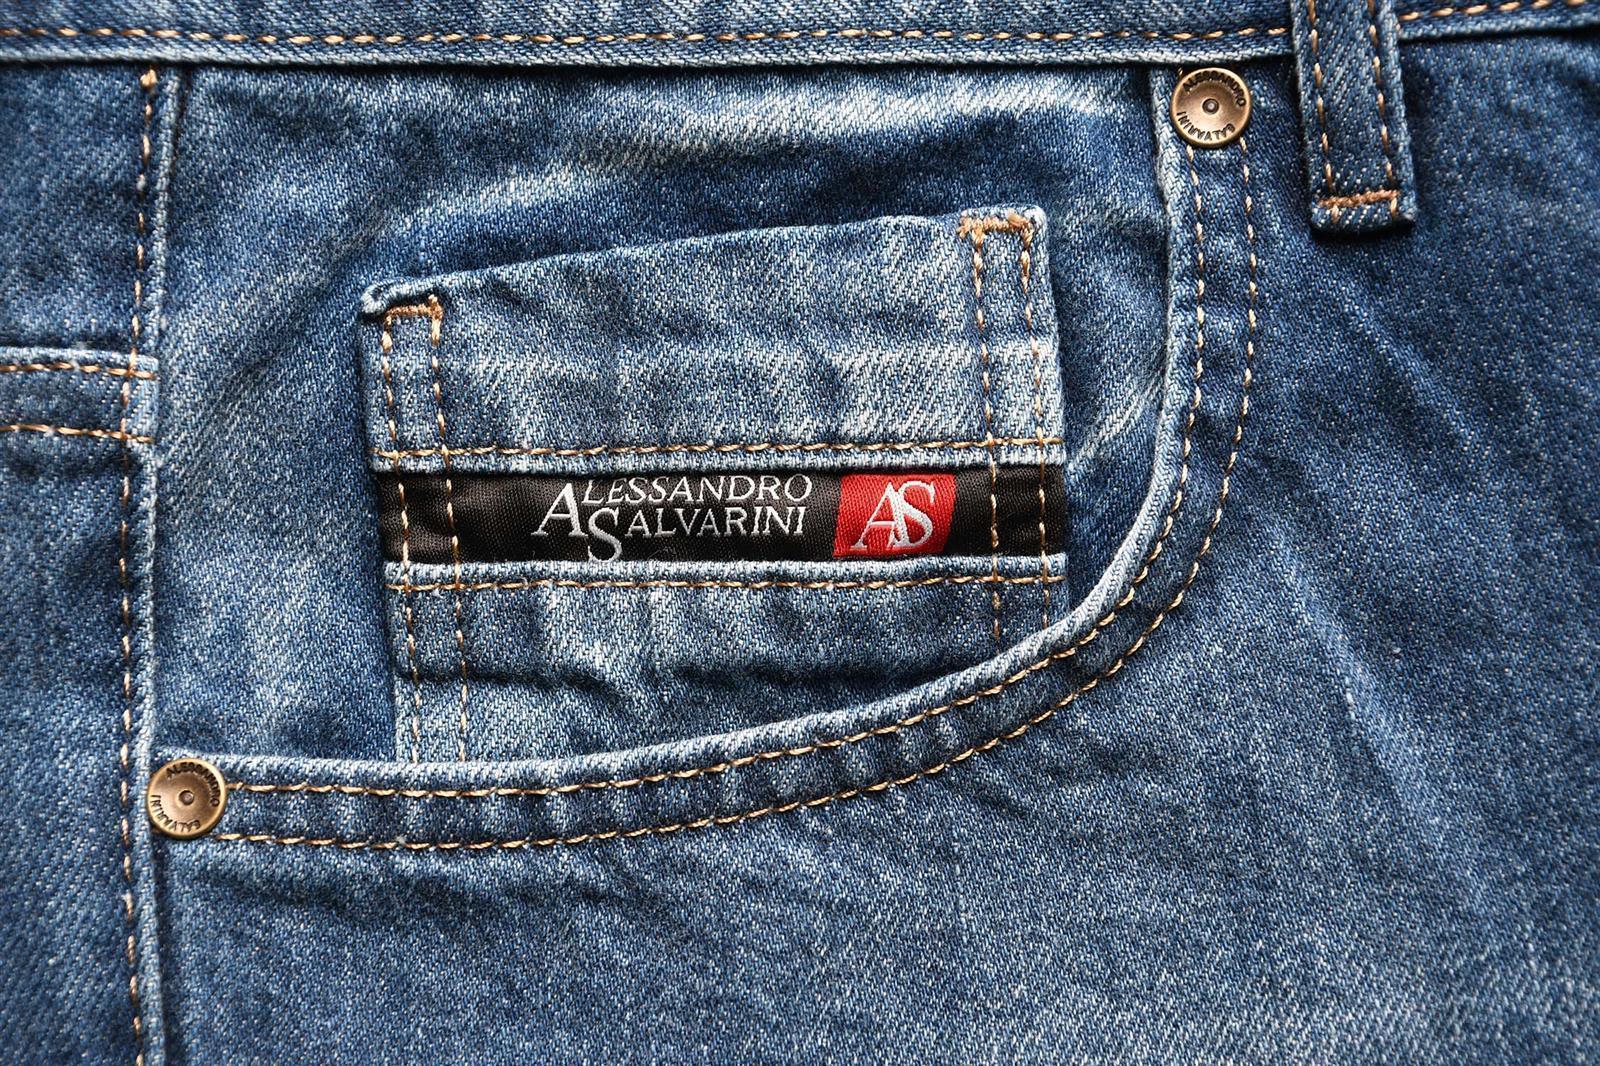 A-Salvarini-Beppo-Designer-Herren-Jeans-Hose-Basic-Jeanshose-Comfort-Fit Indexbild 7